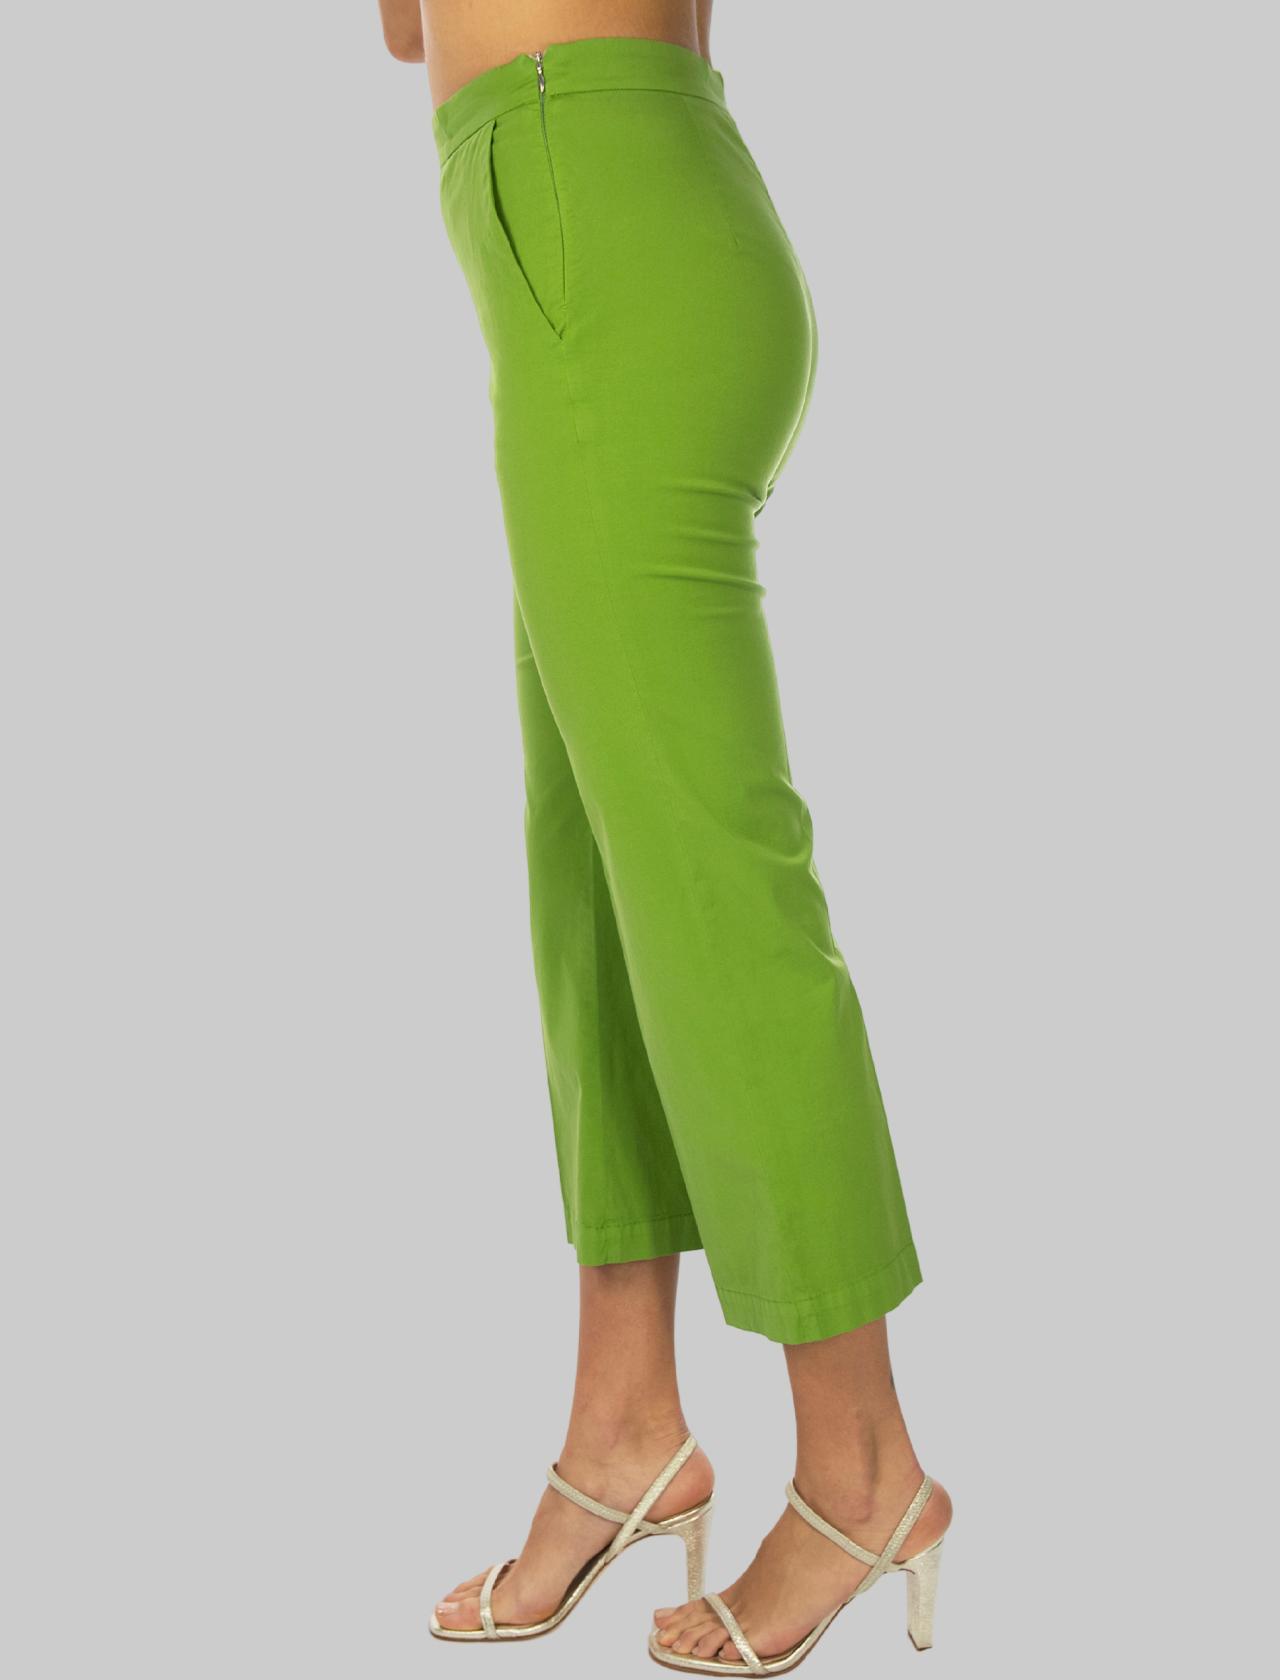 Women's Clothing Stretch Satin Cotton Pants Green Maliparmi | Skirts and Pants | JH71441013760131